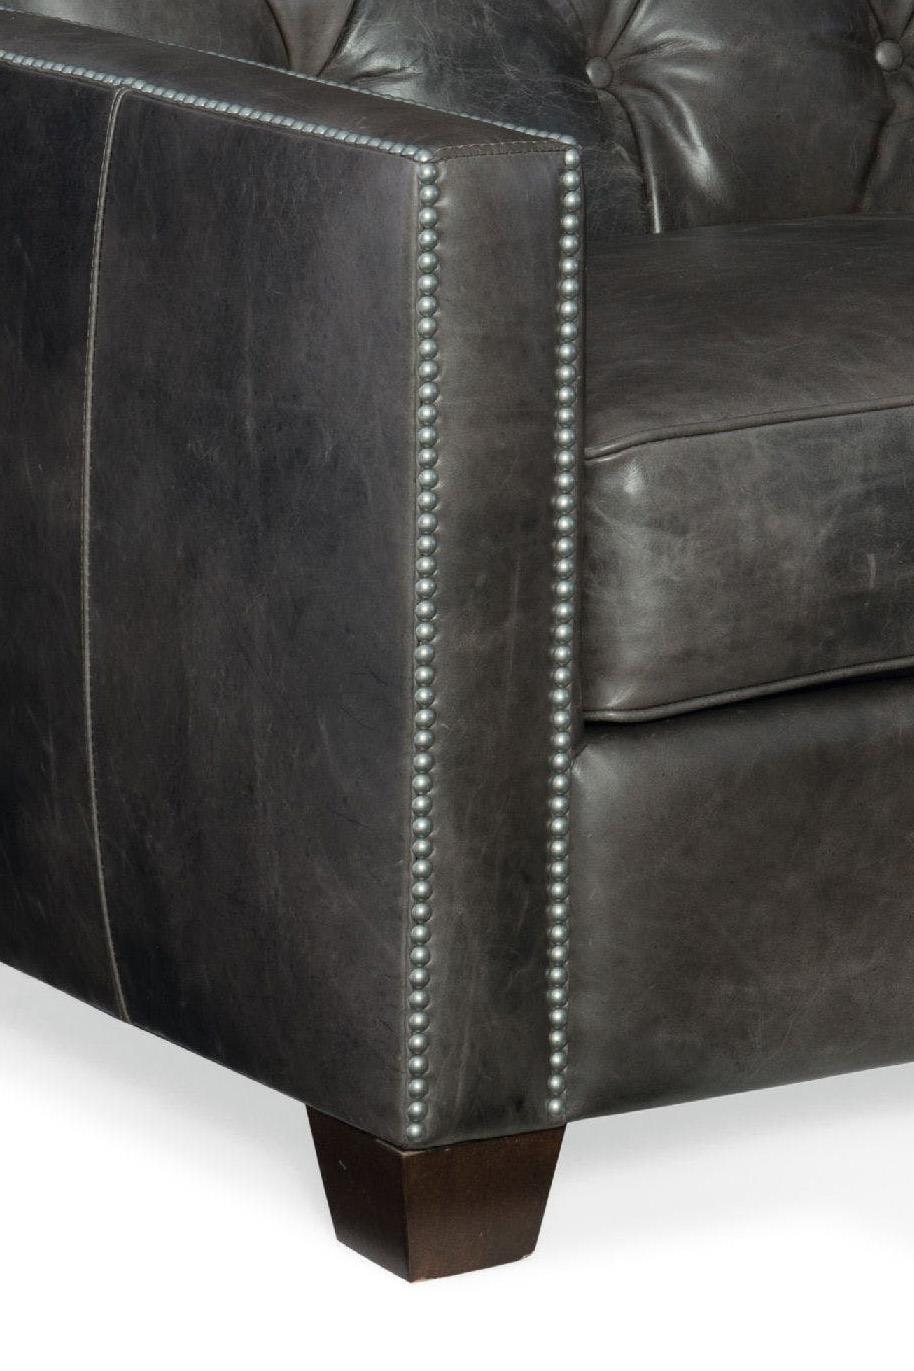 Hooker Furniture Trellis Transitional Stationary Leather Sofa With Nailhead  Trim - Wayside Furniture - Sofas